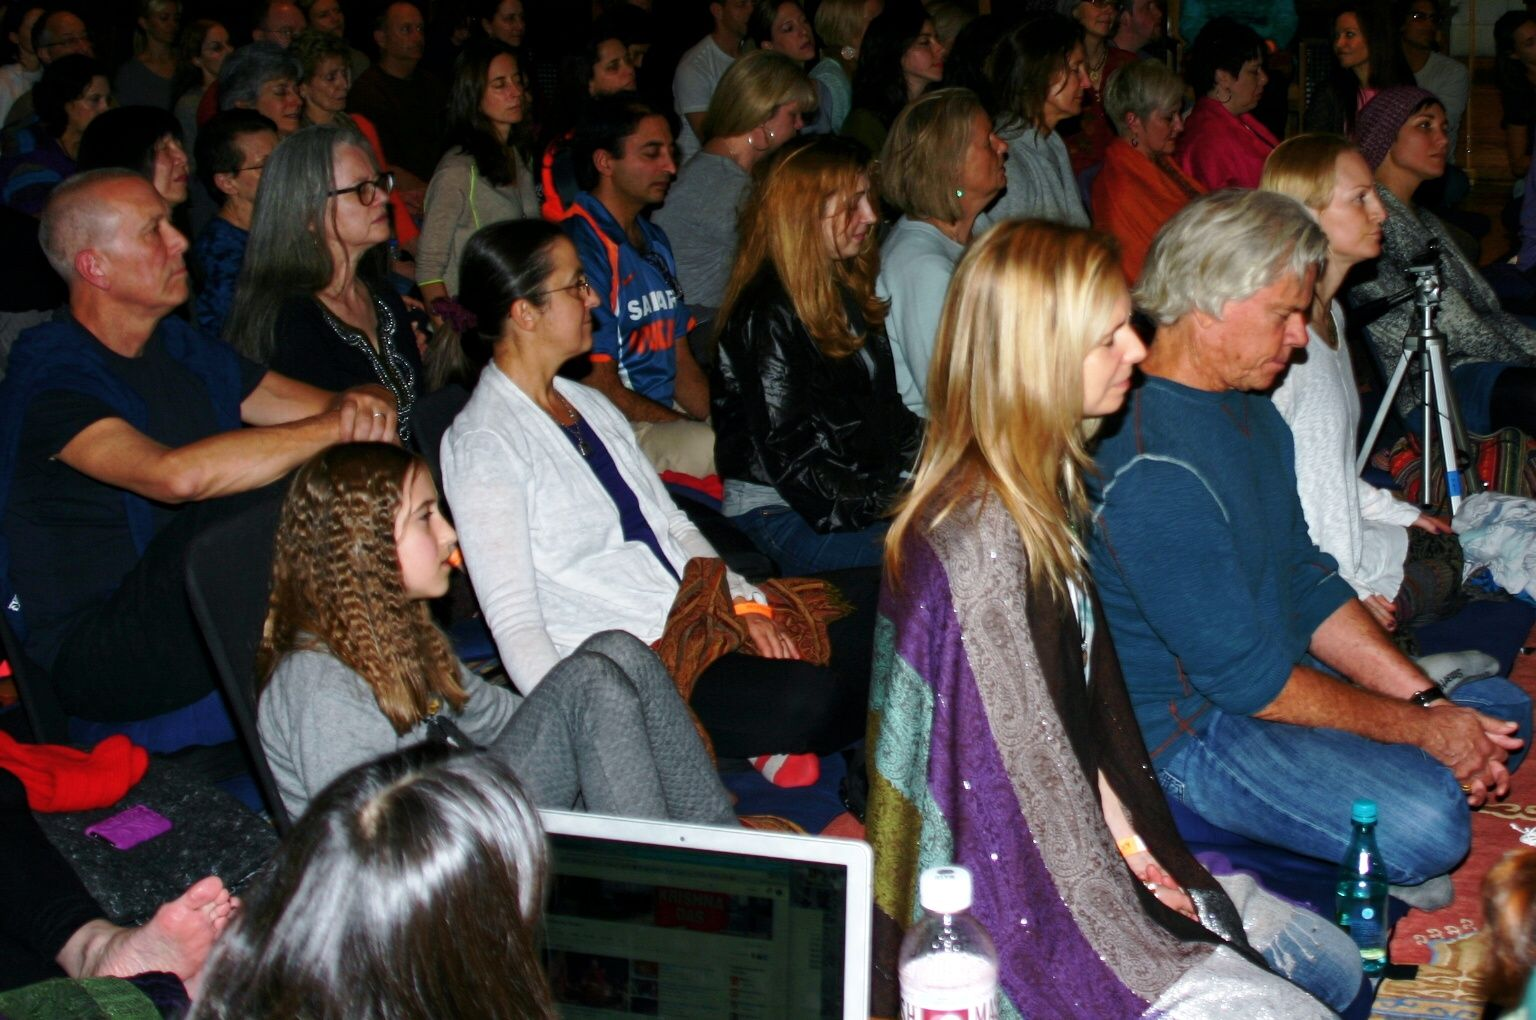 Audience in contemplation Krishna das, Devotions, The